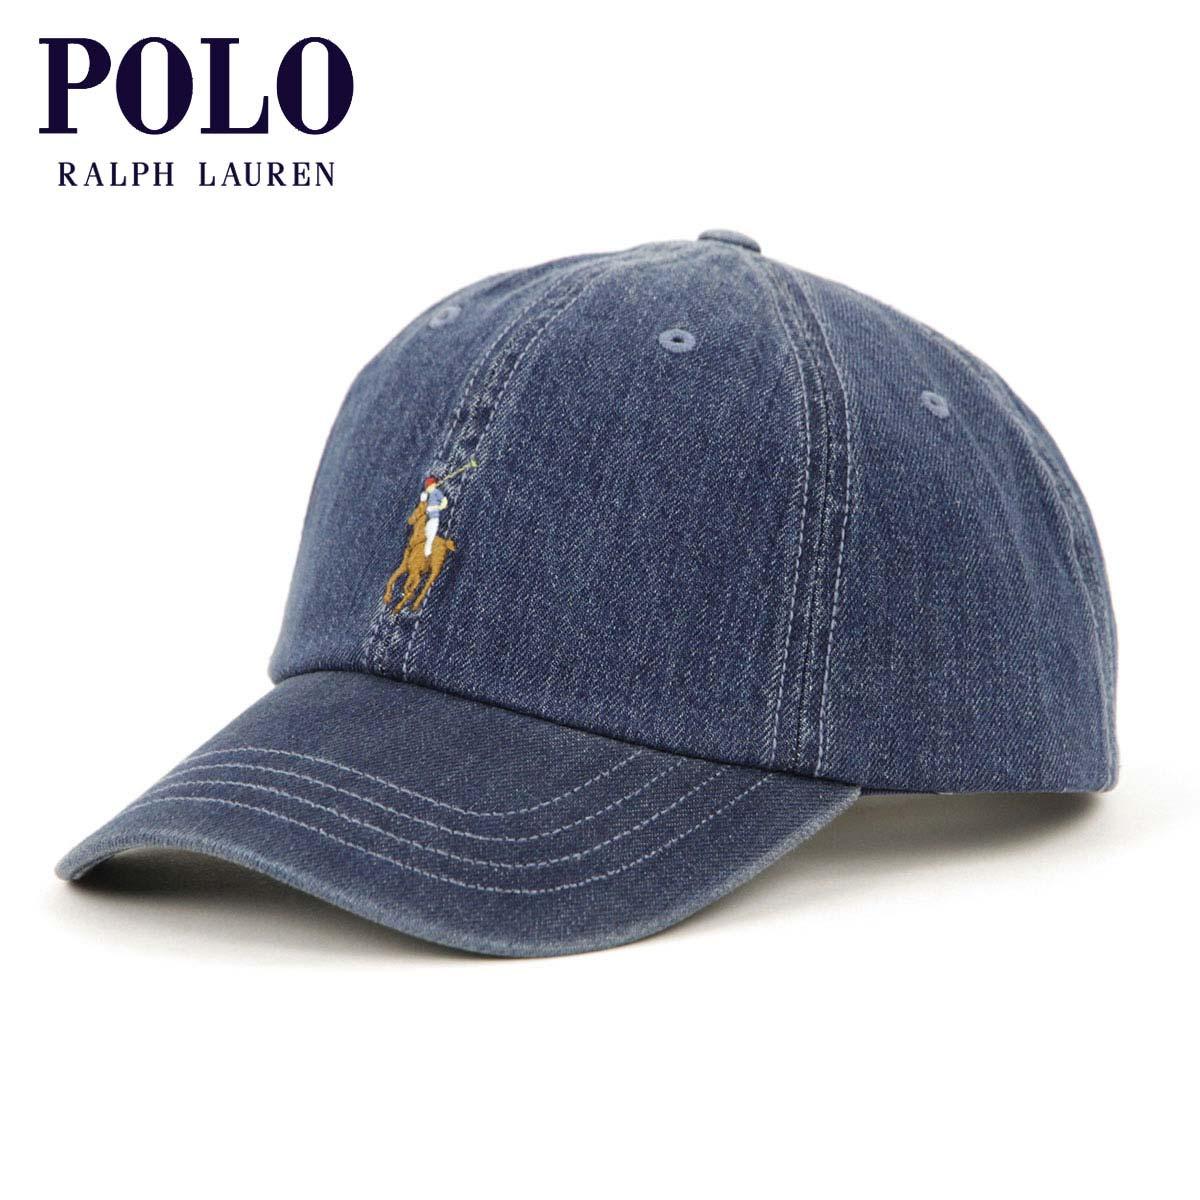 Polo Ralph Lauren POLO RALPH LAUREN regular article men cap pony logo hat  COTTON CHINO BASEBALL CAP 38820dc839e8